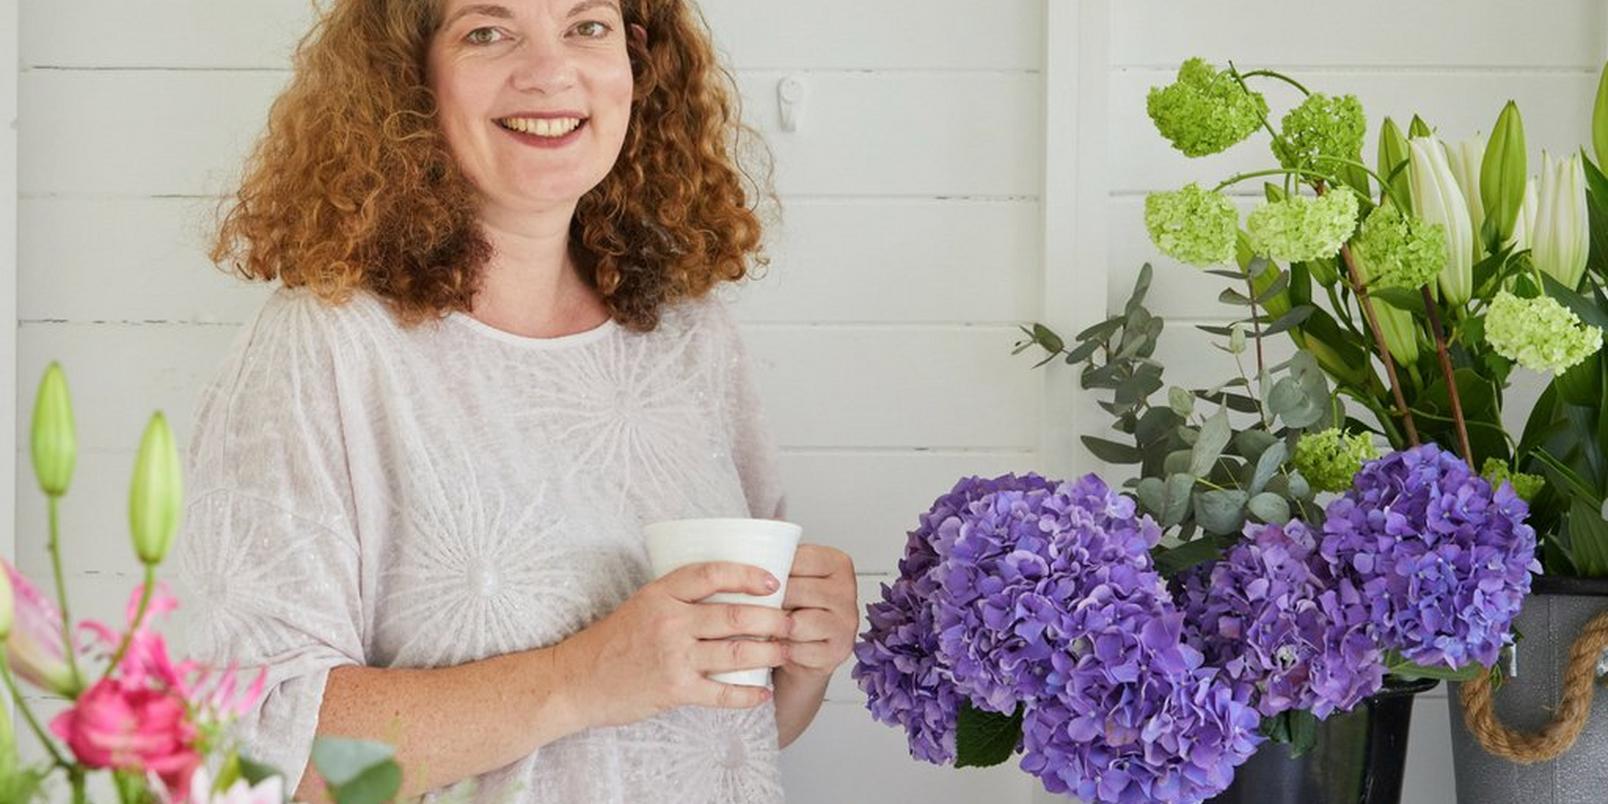 laura-leong-interflora-florist-year-2018-2